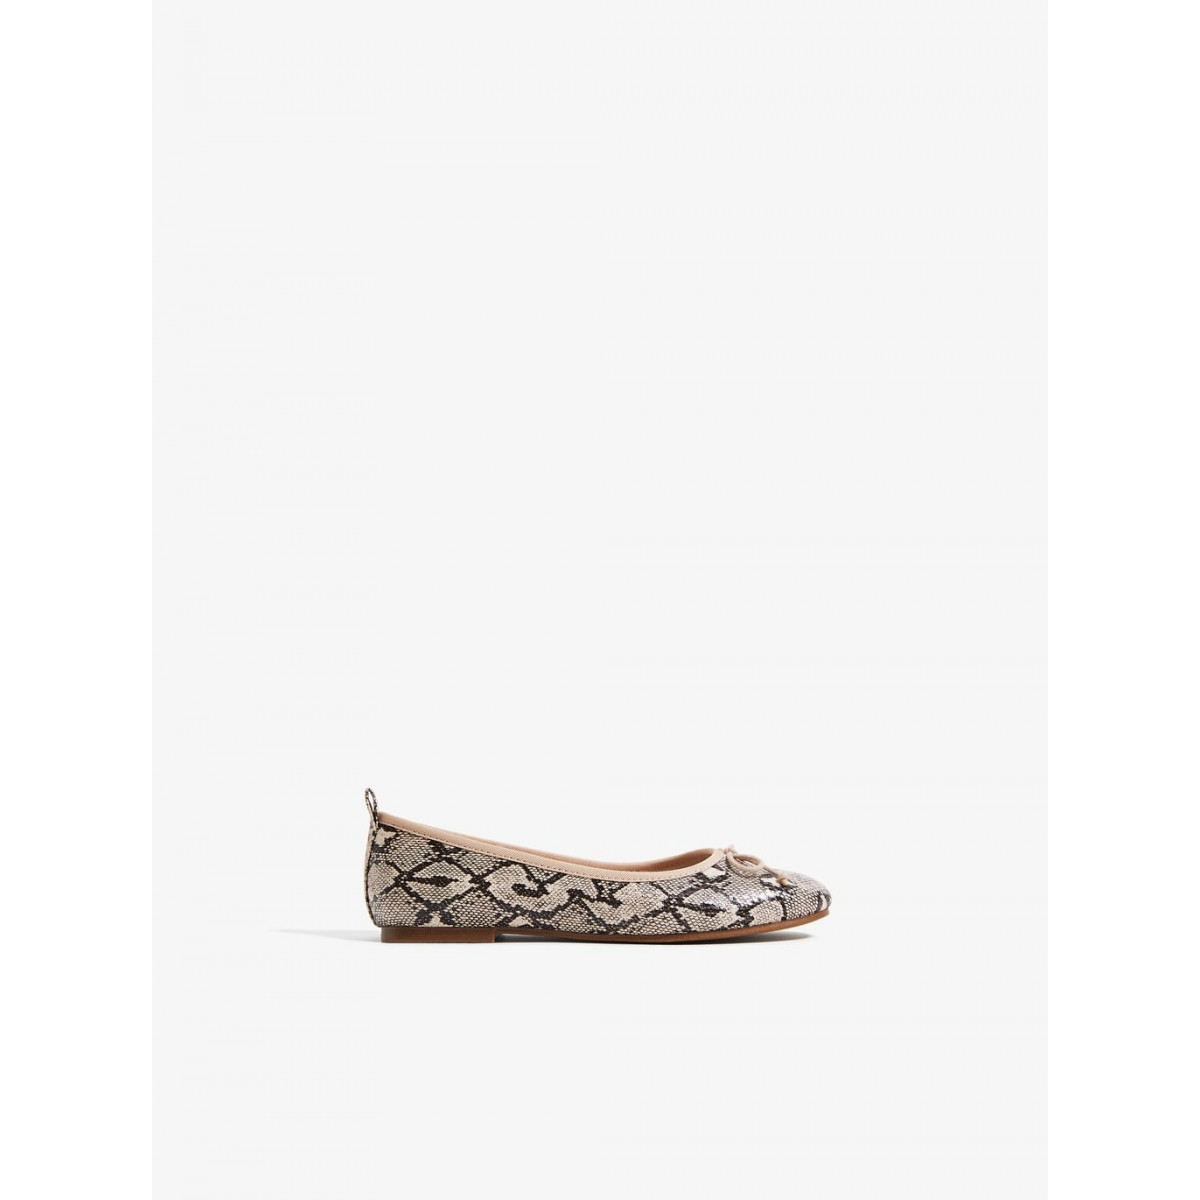 Zara Snake Print Ballerina